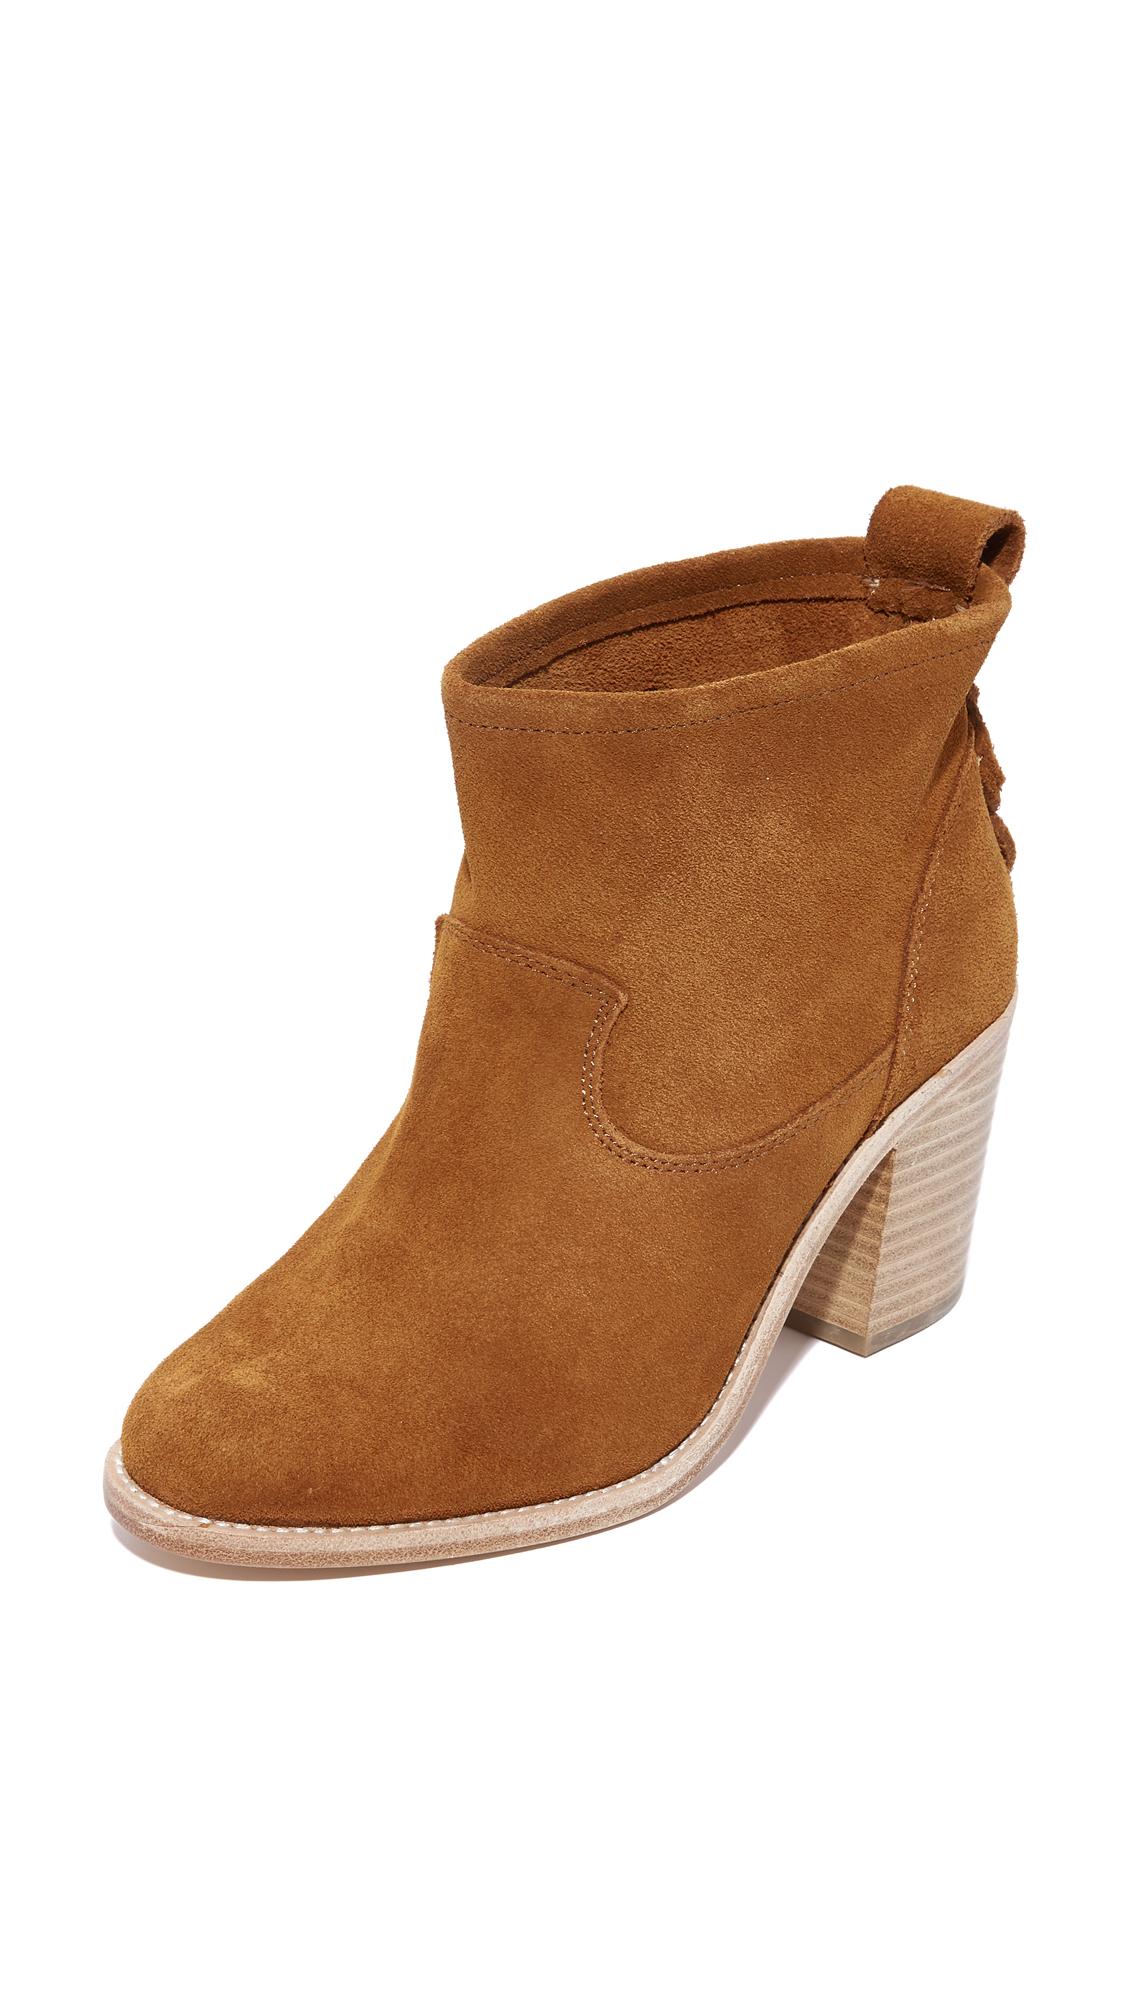 Soludos Heeled Booties - Saddle